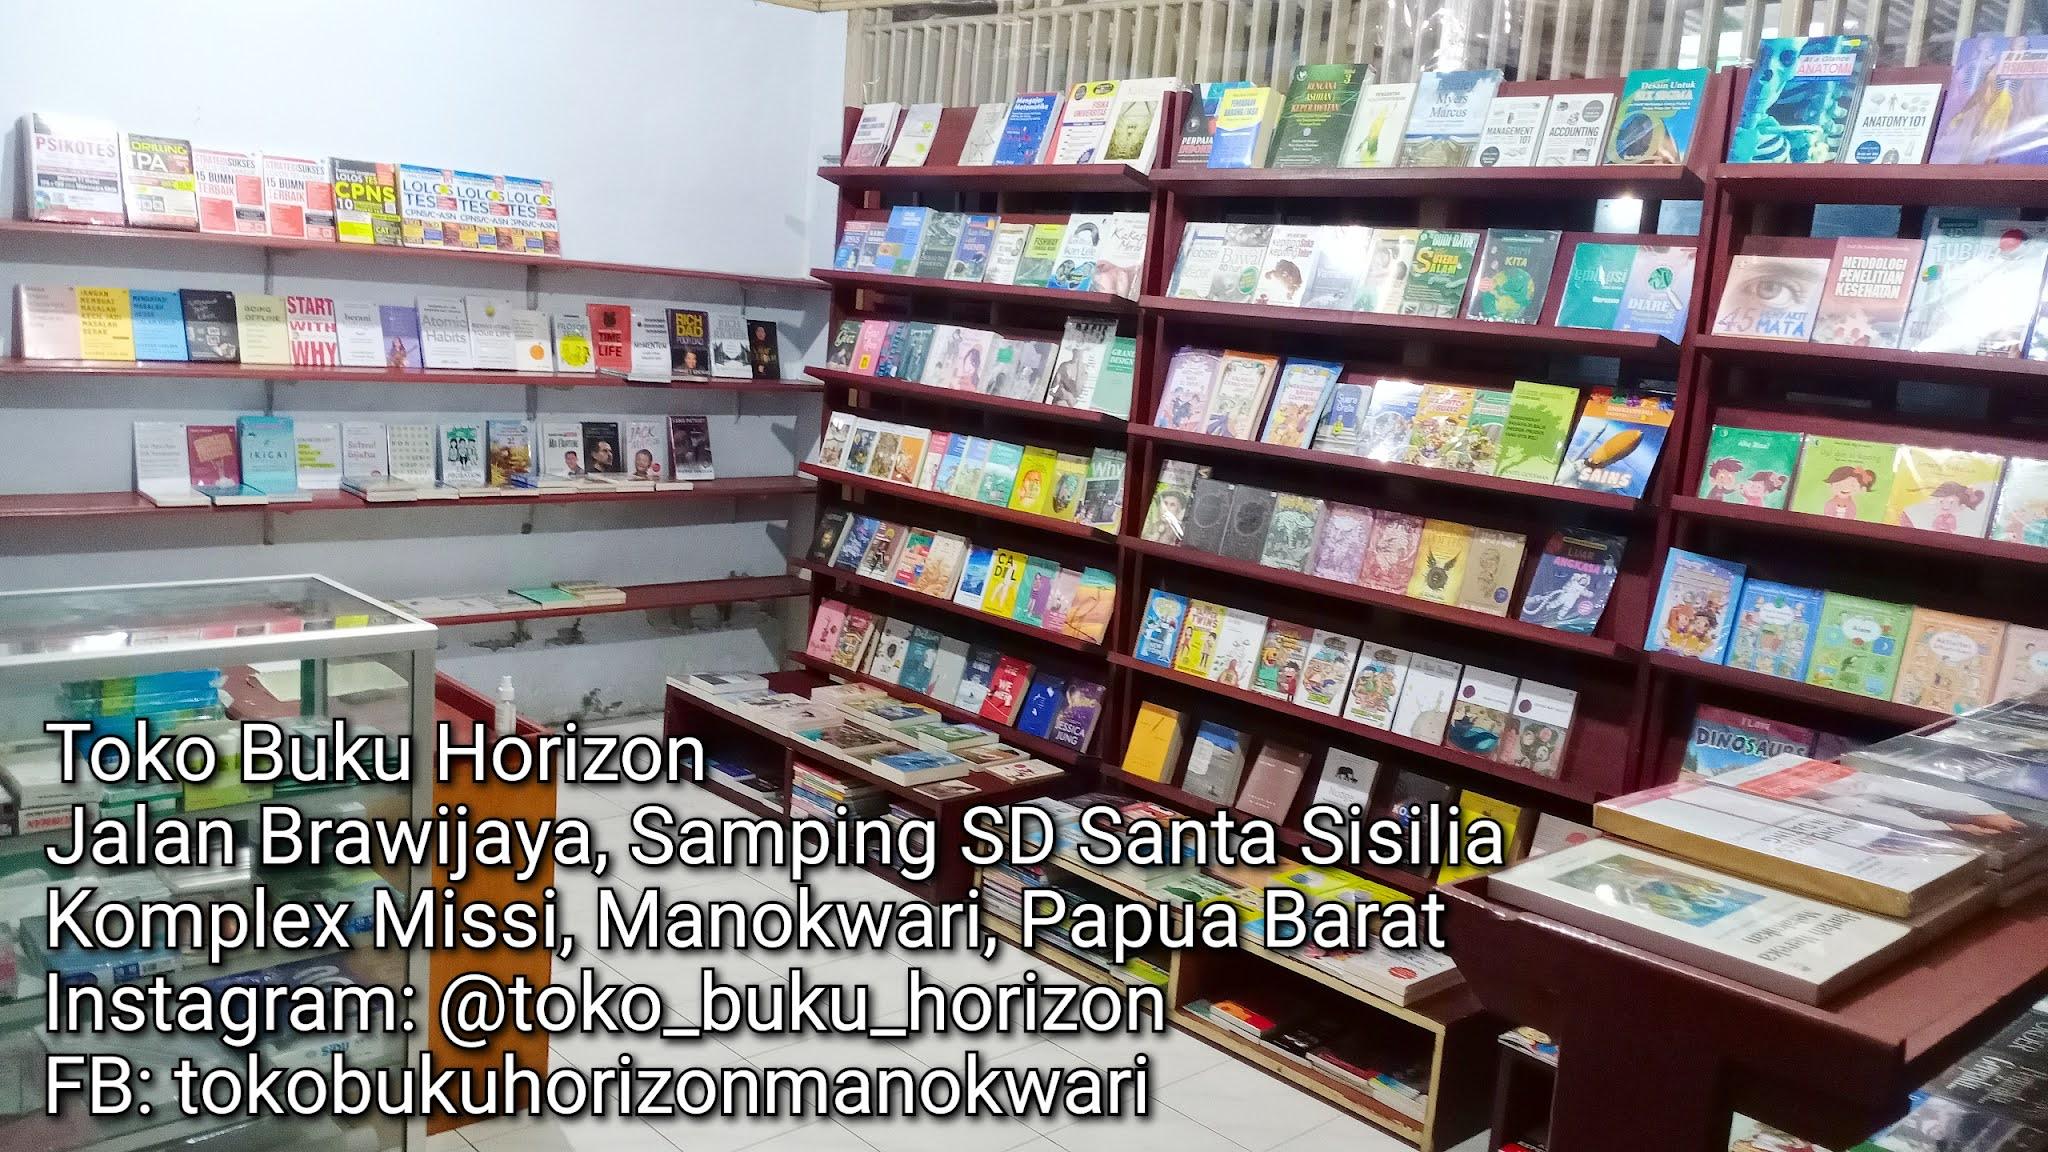 buku novel, pengembangan diri, textbook kuliah dan buku pelajaran sekolah dasar